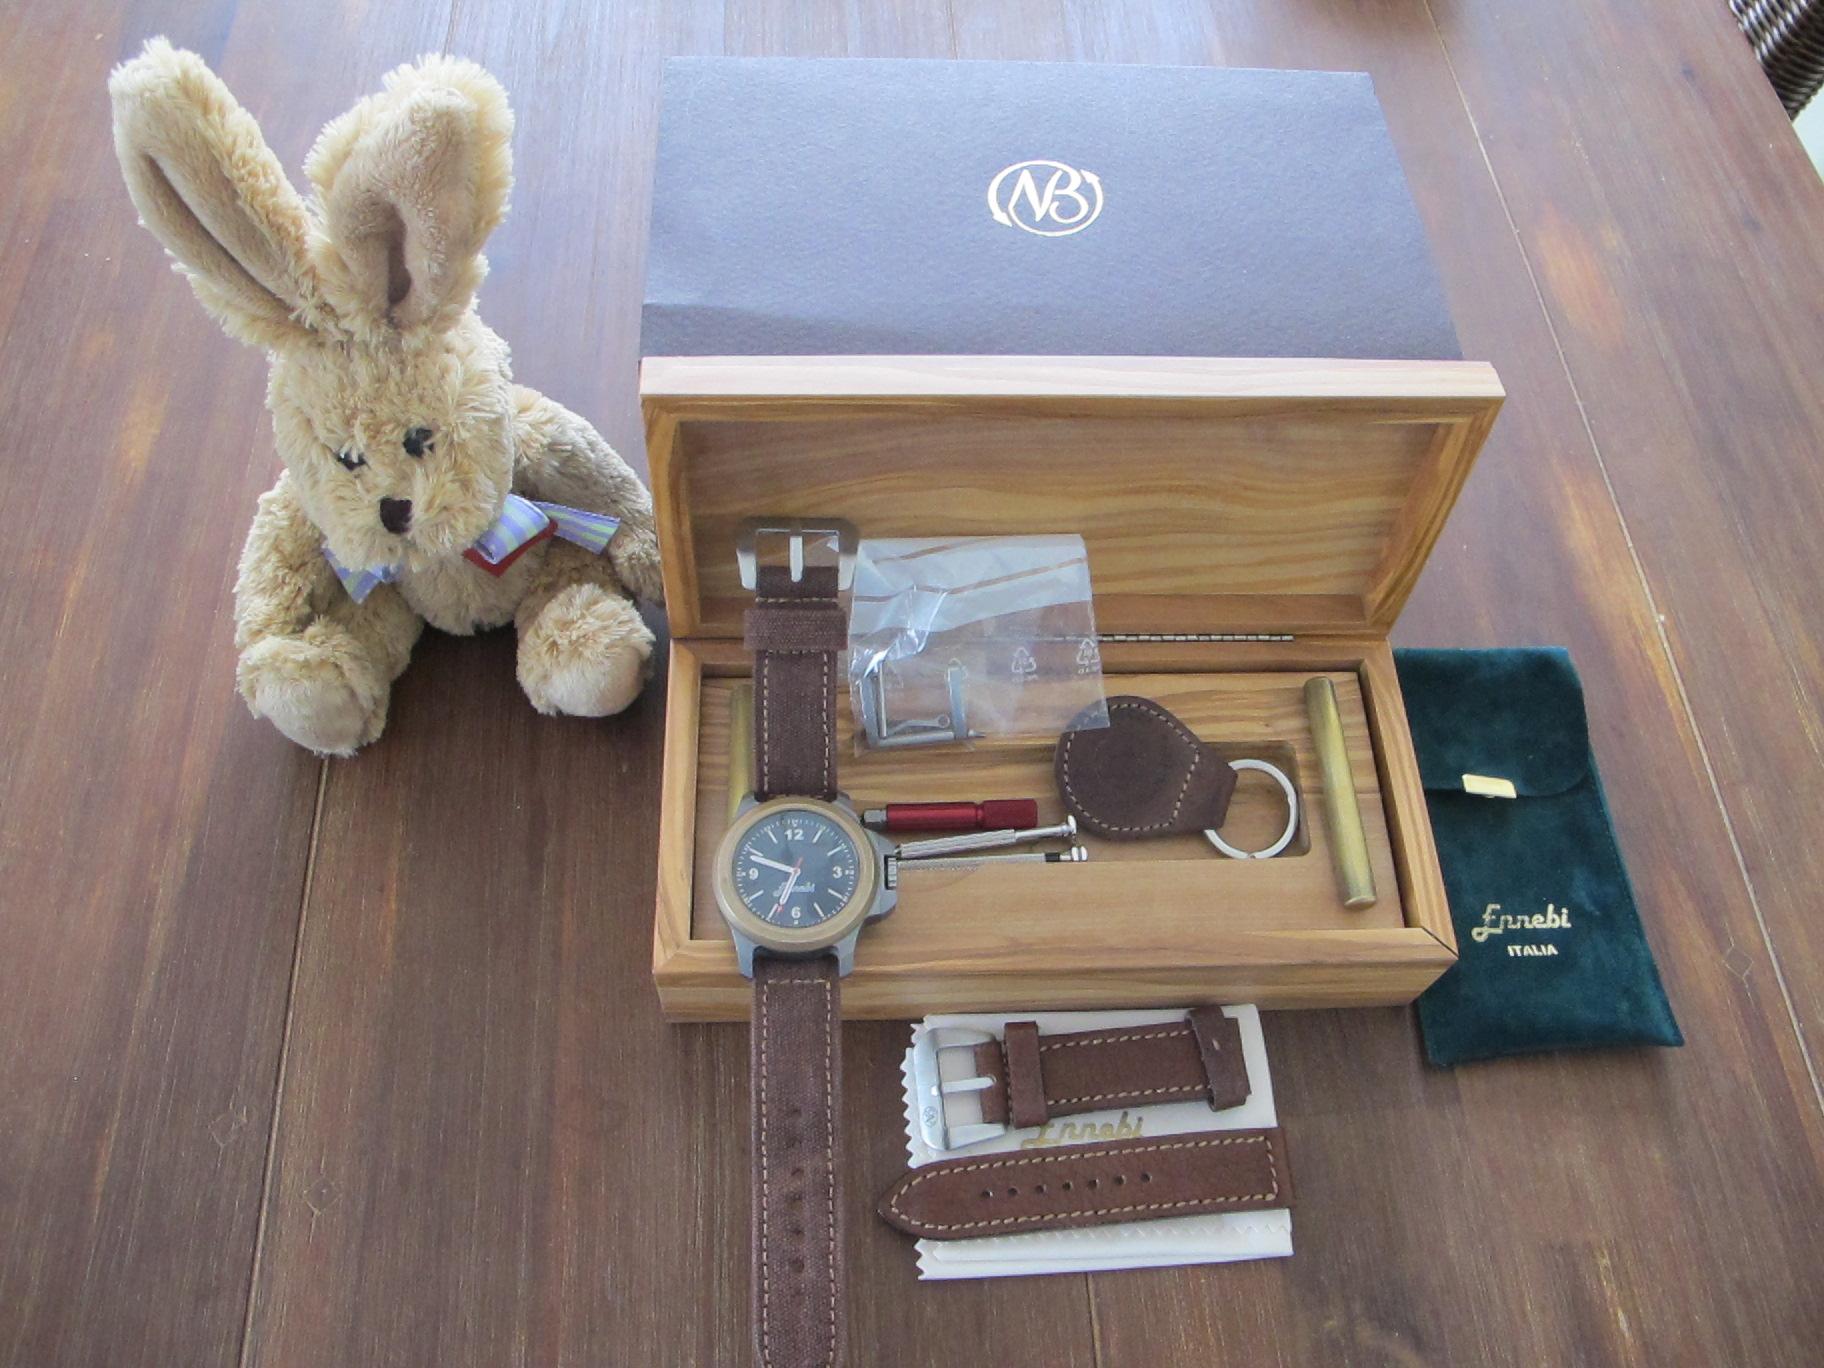 Erledigt] ENNEBI FONDALE 9660-100 mit Bronze Lünette - UhrForum